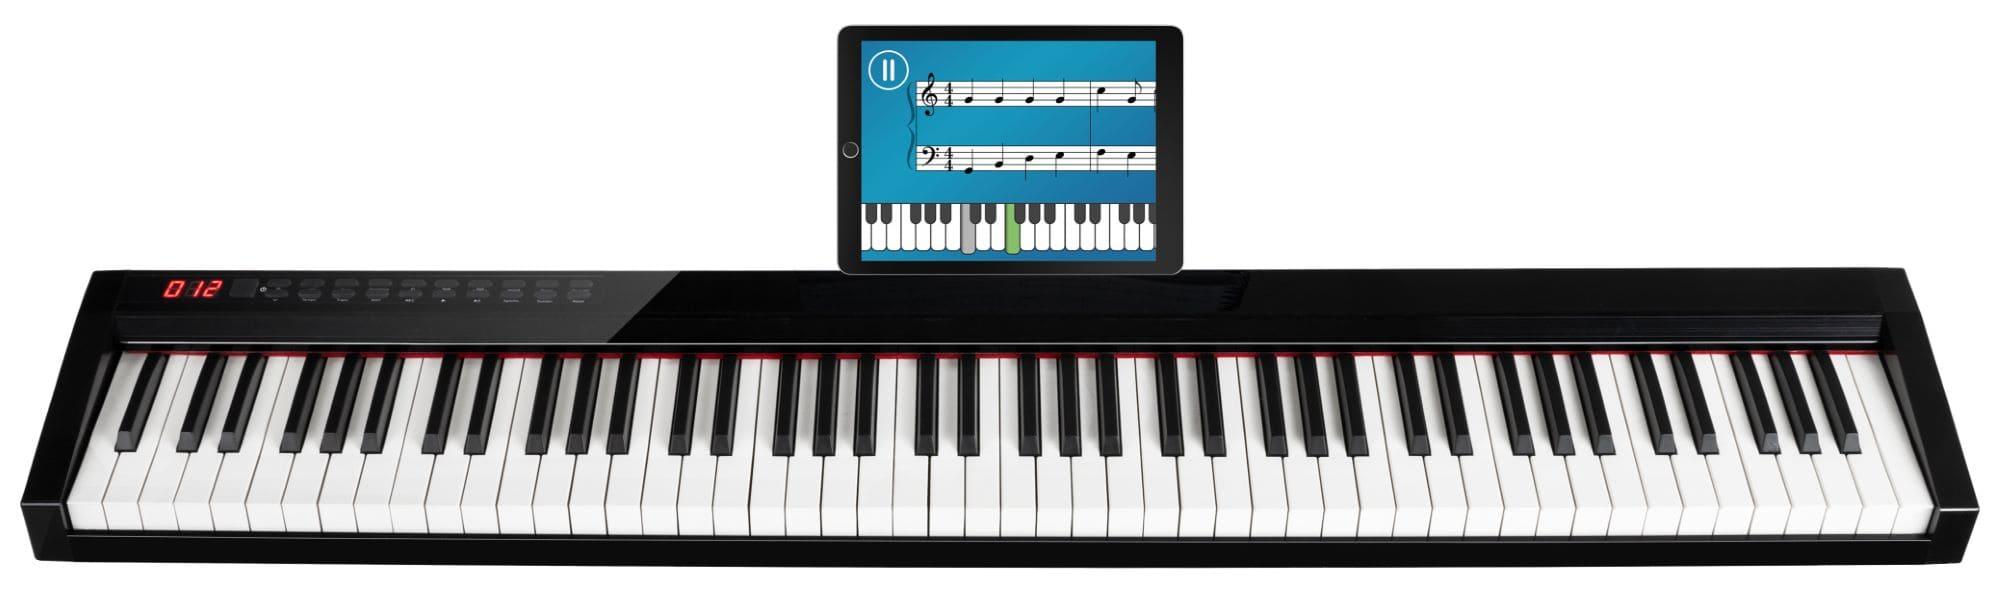 Homekeyboards - FunKey SP 588 Easy Piano - Onlineshop Musikhaus Kirstein